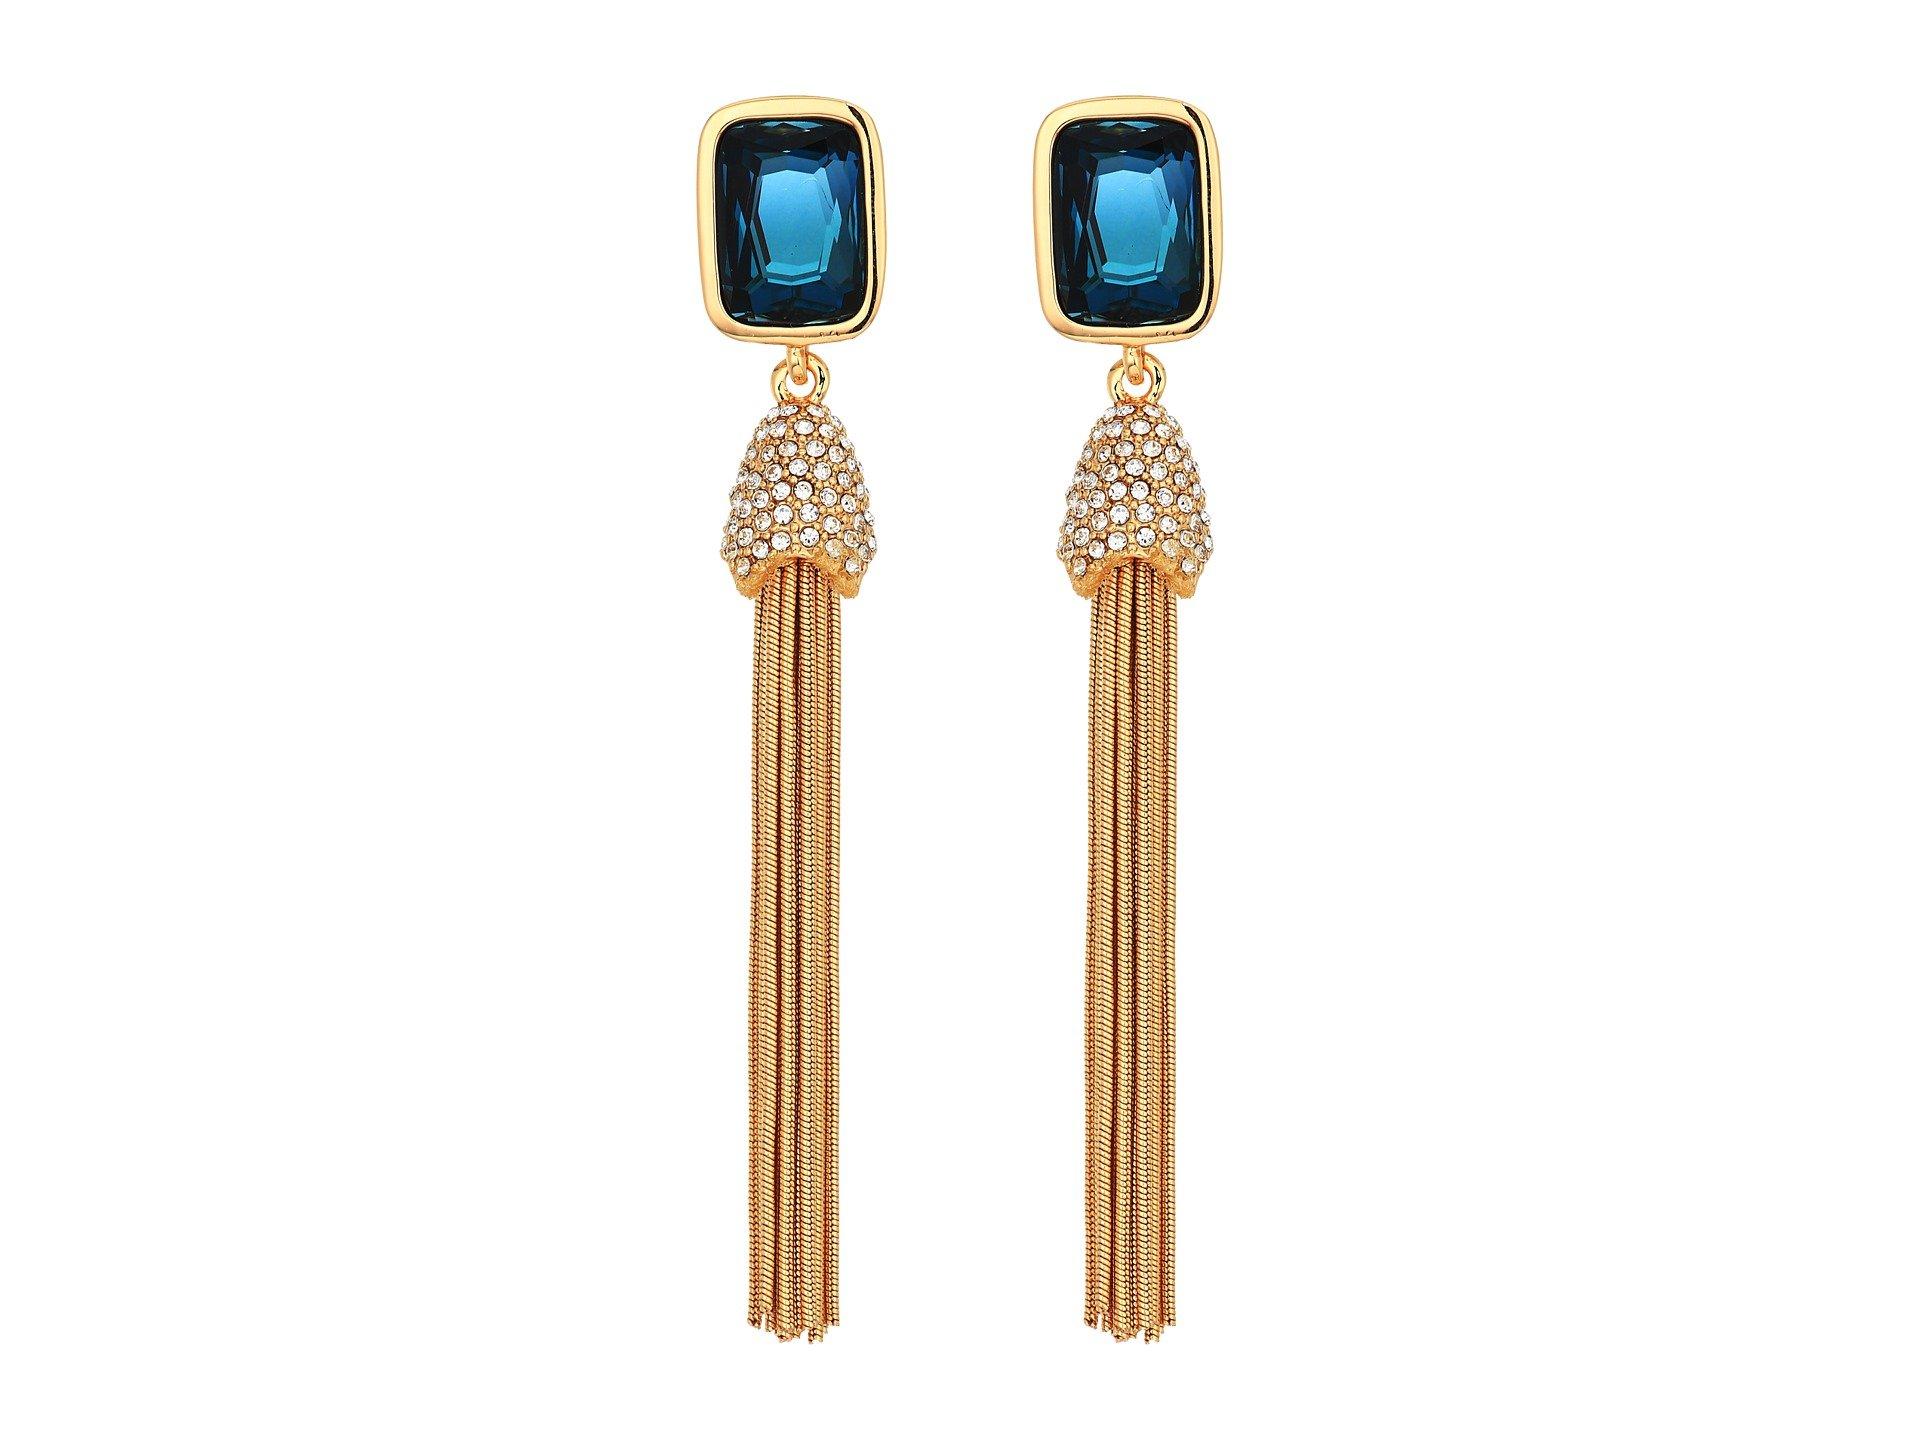 Pendientes para Mujer Vince Camuto Crystal and Tassel Earrings  + Vince Camuto en VeoyCompro.net